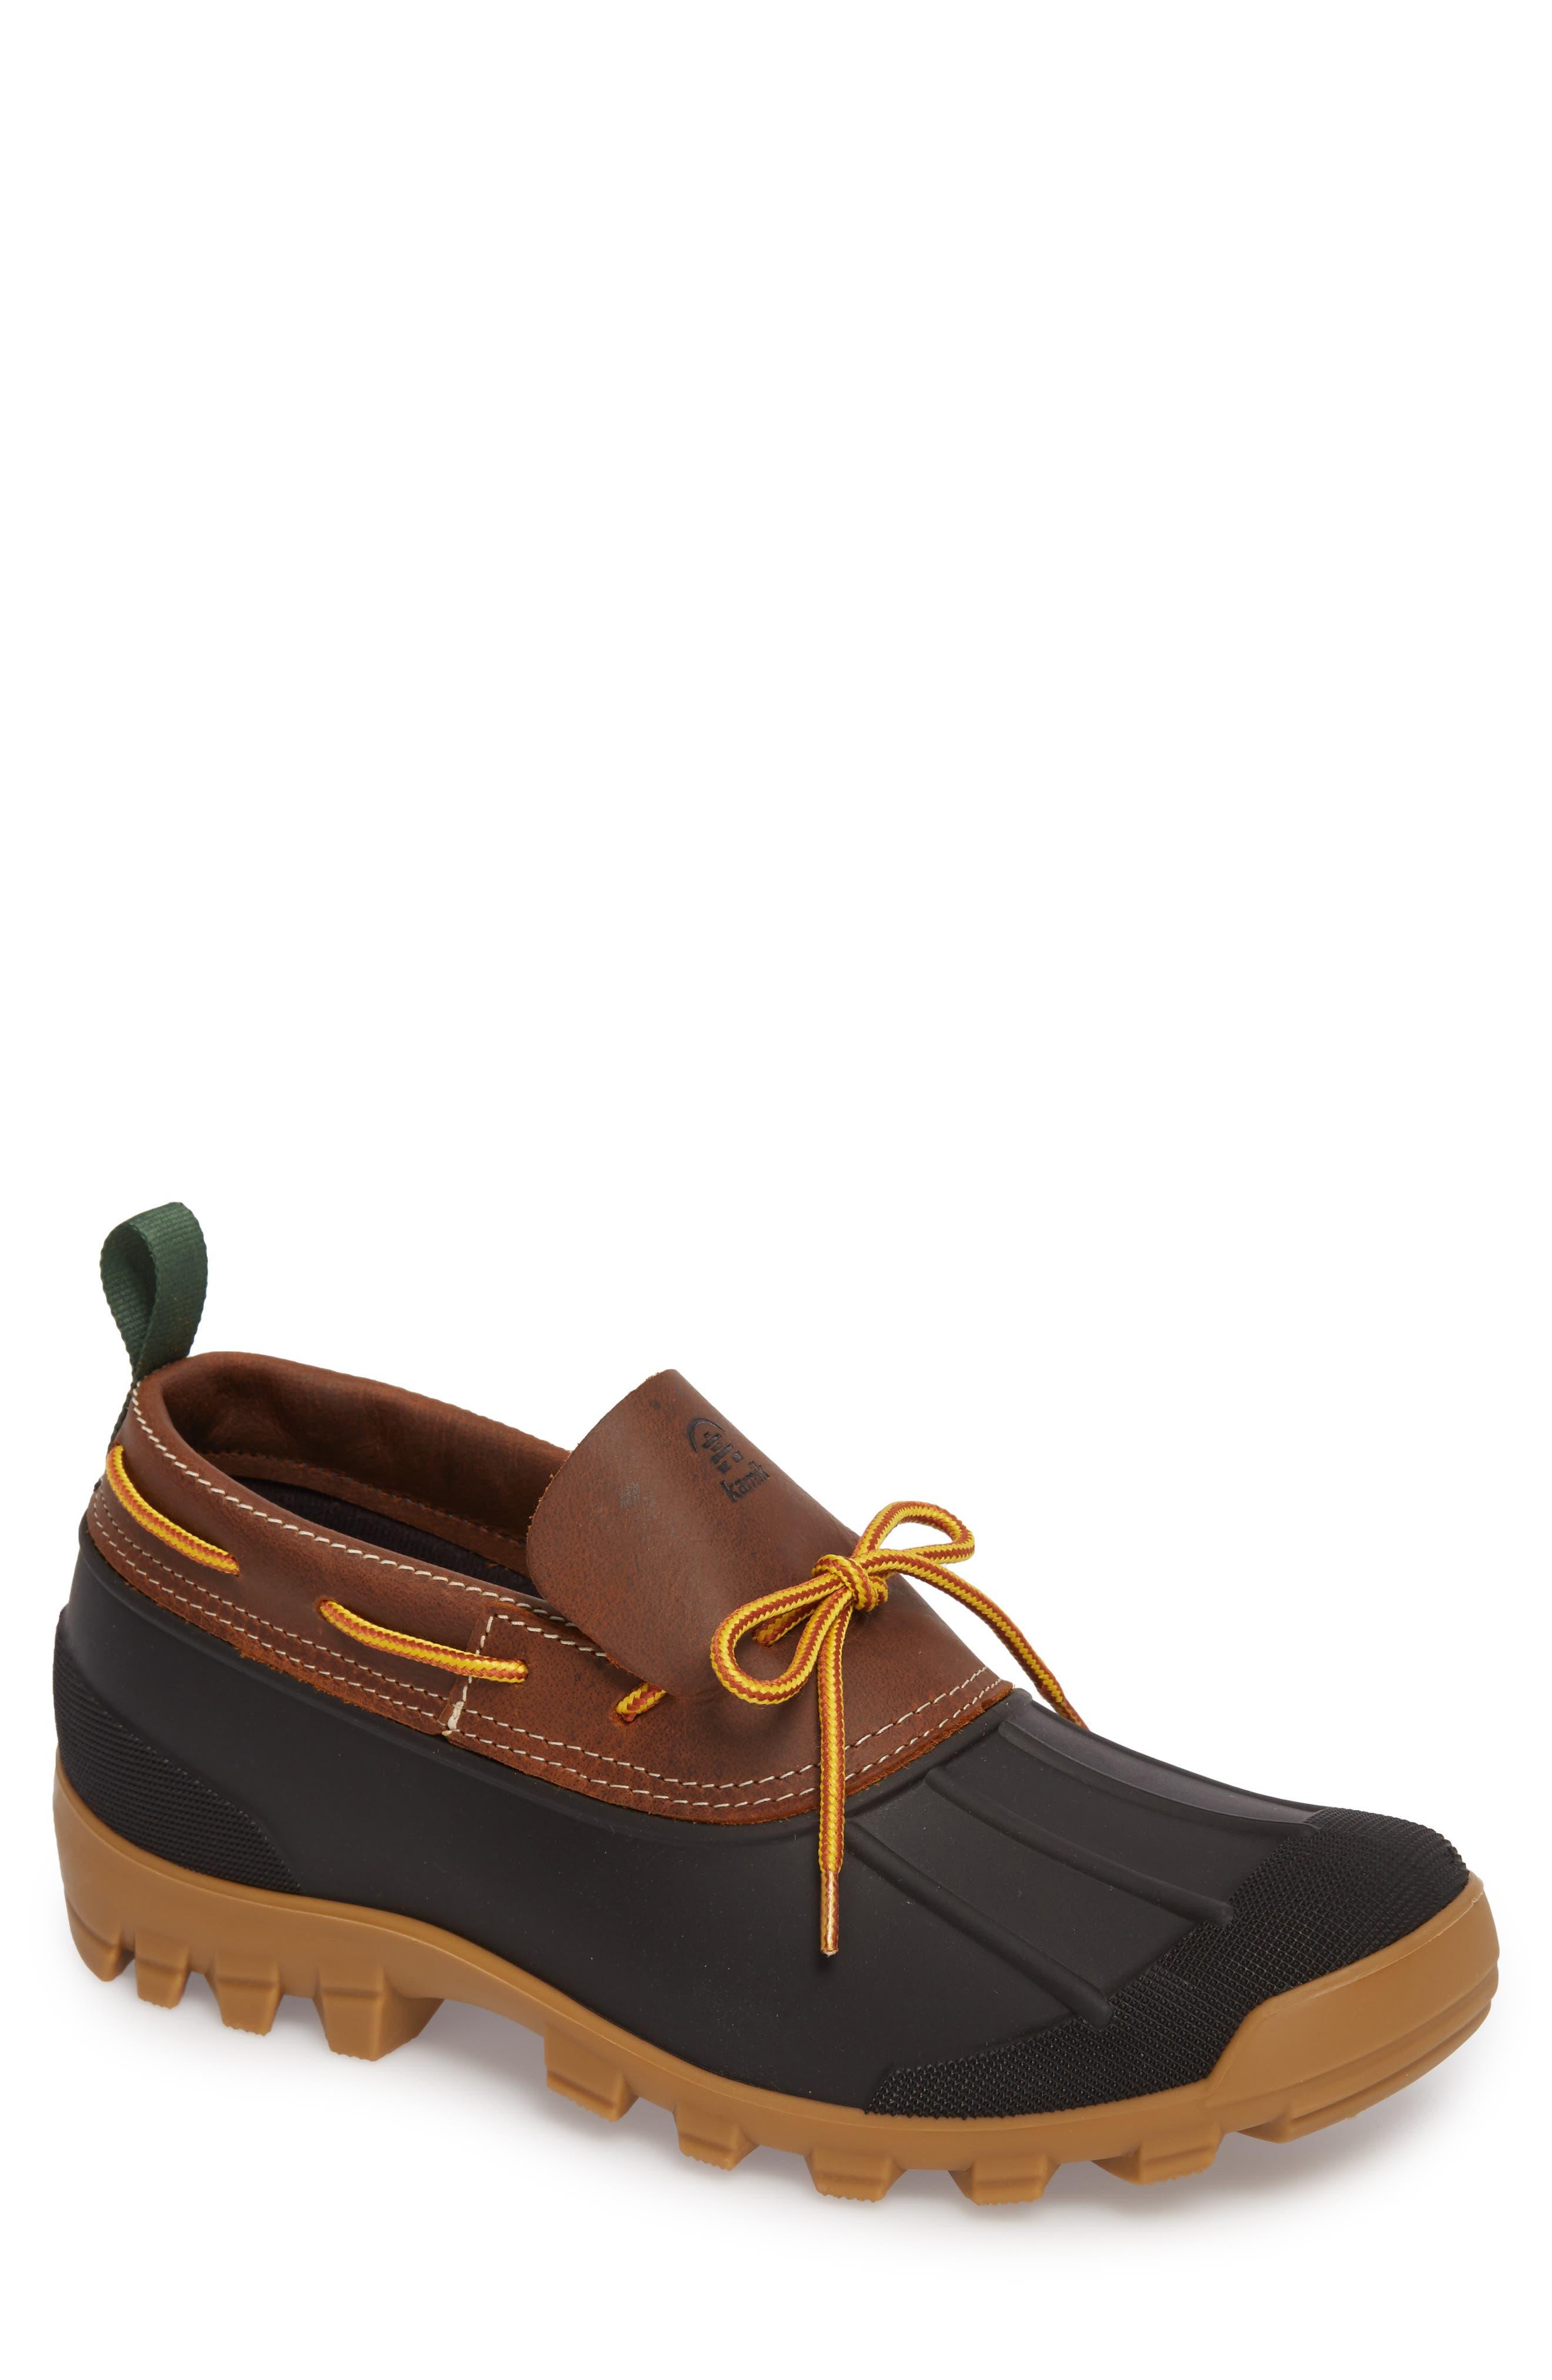 Yukon Short Boot,                         Main,                         color, Dark Brown Leather